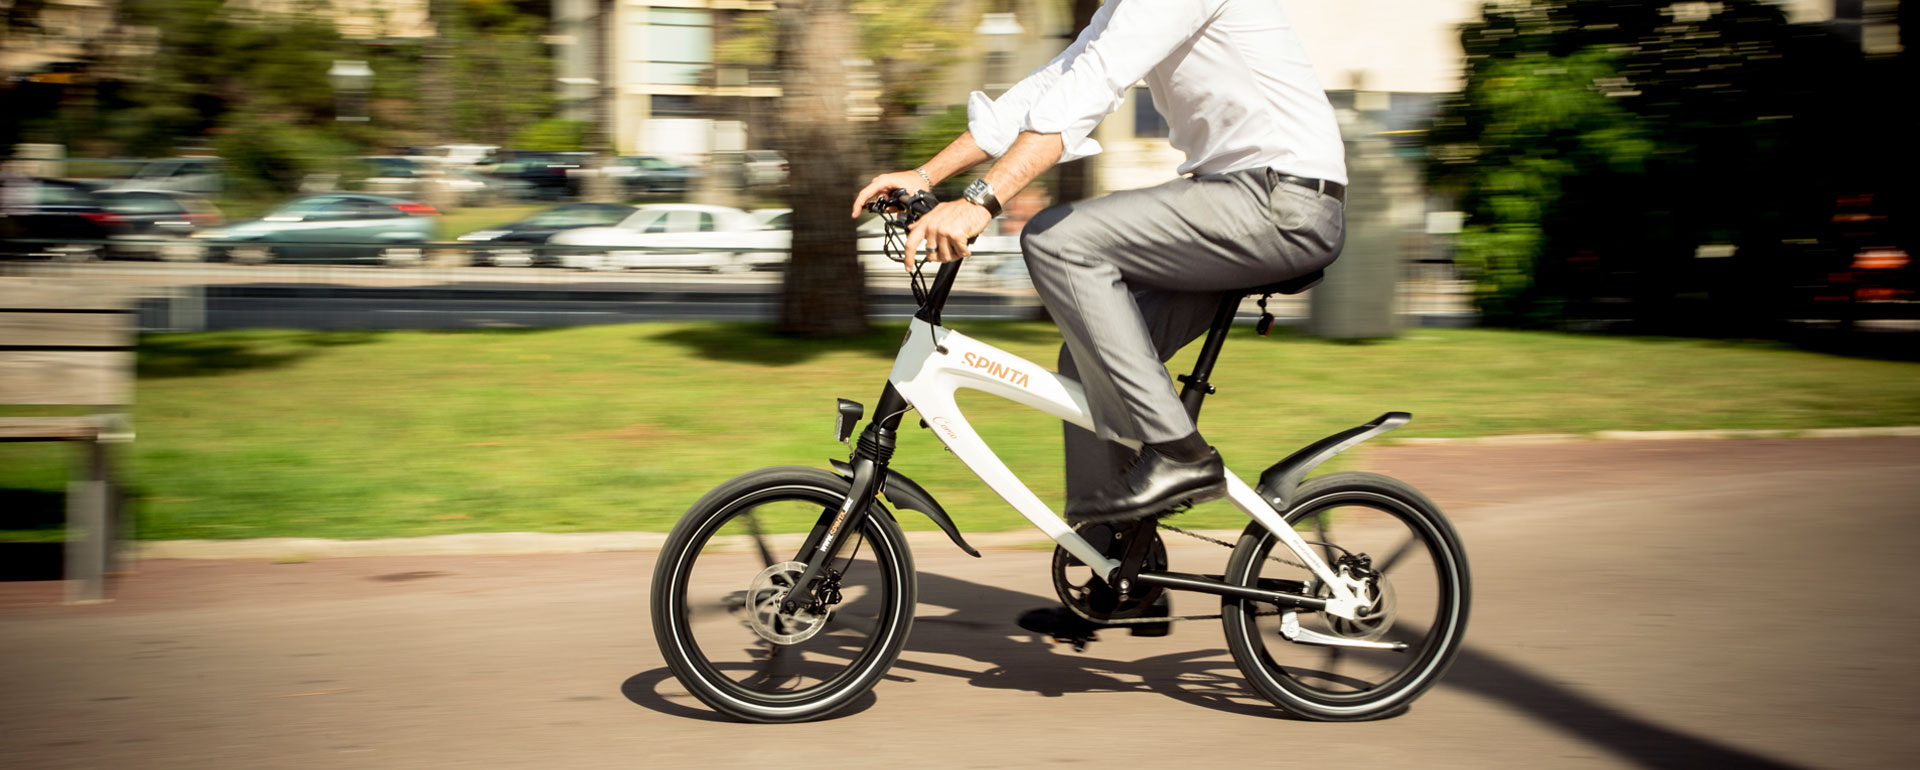 Bicicleta Electrica Trabajo